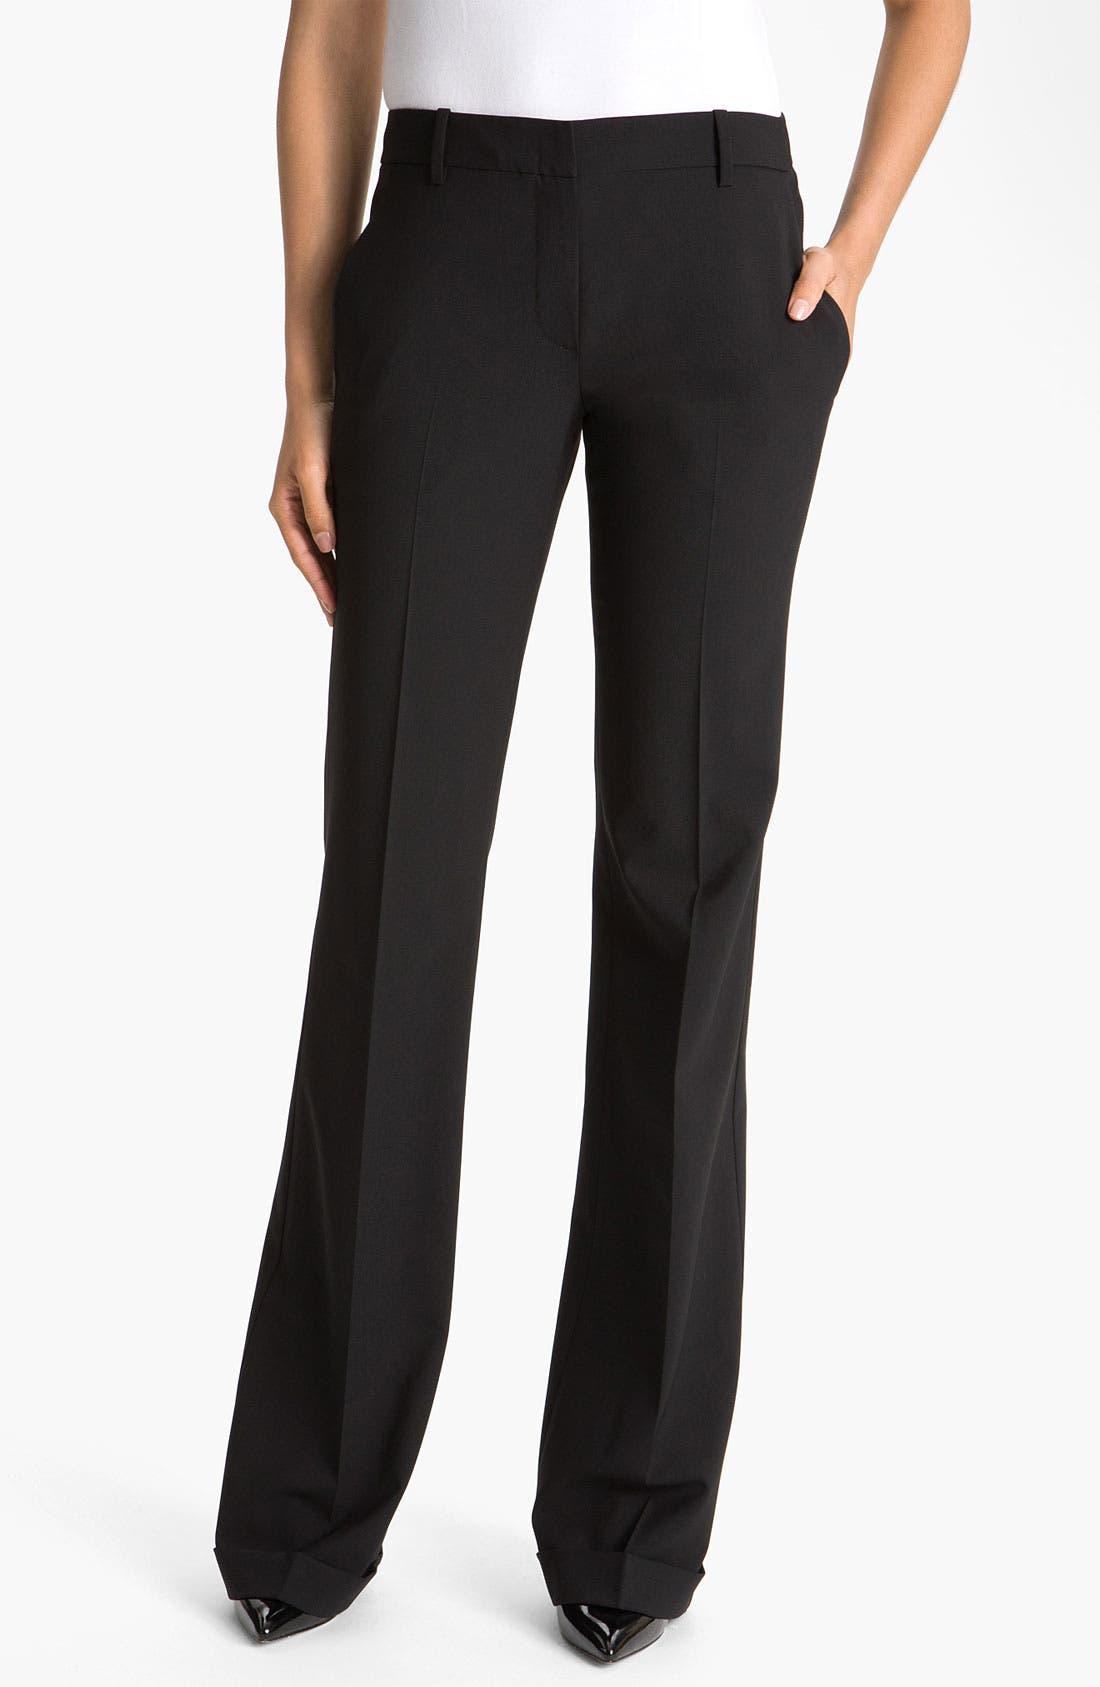 Main Image - Theory 'Lauren - Tailor' Cuff Pants